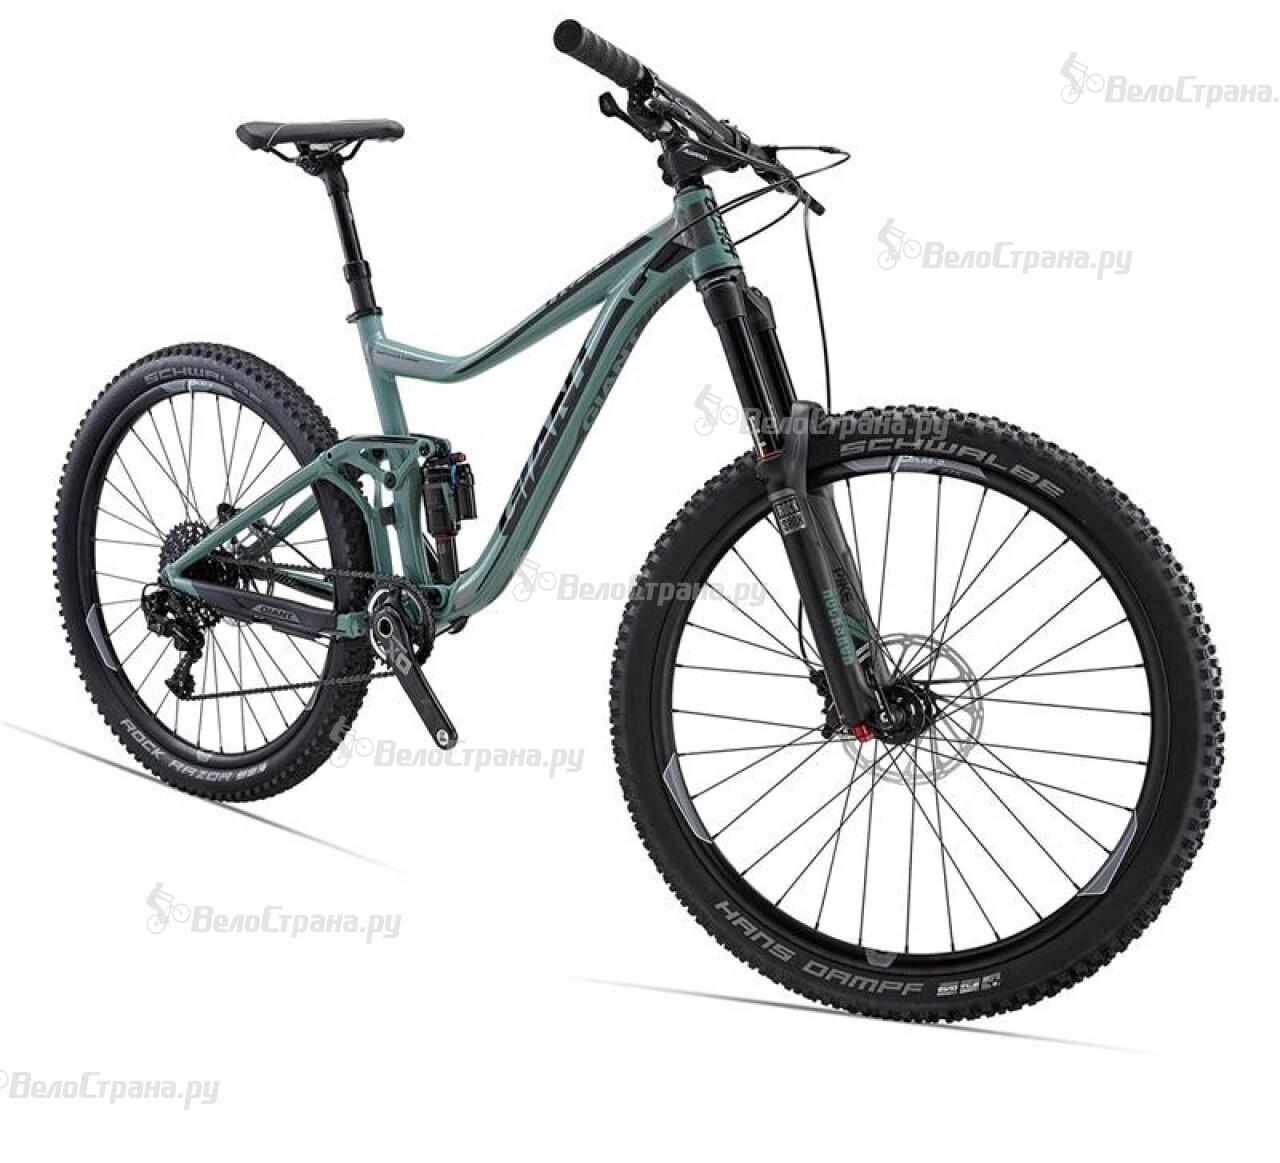 Велосипед Giant Trance SX 27.5 (2015)